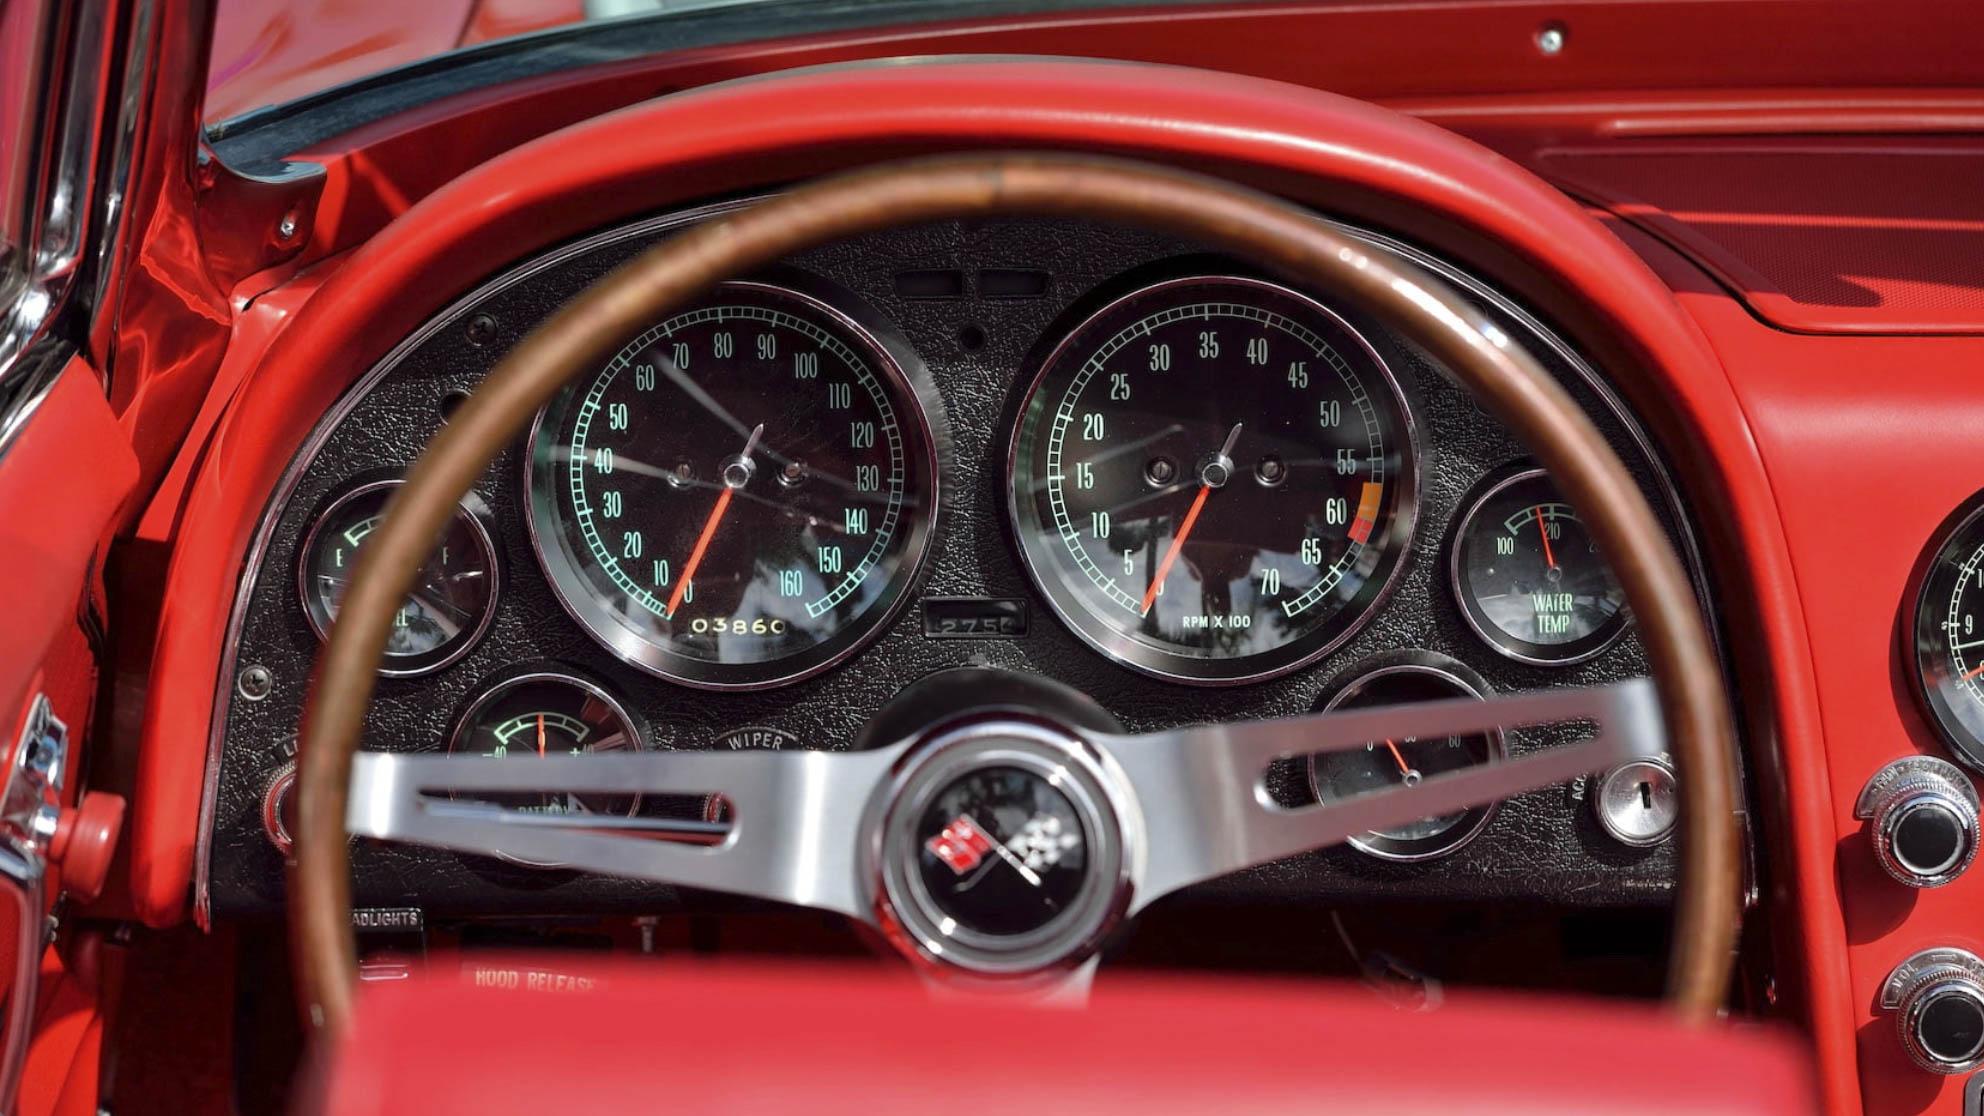 1967 Chevrolet Corvette dashboard